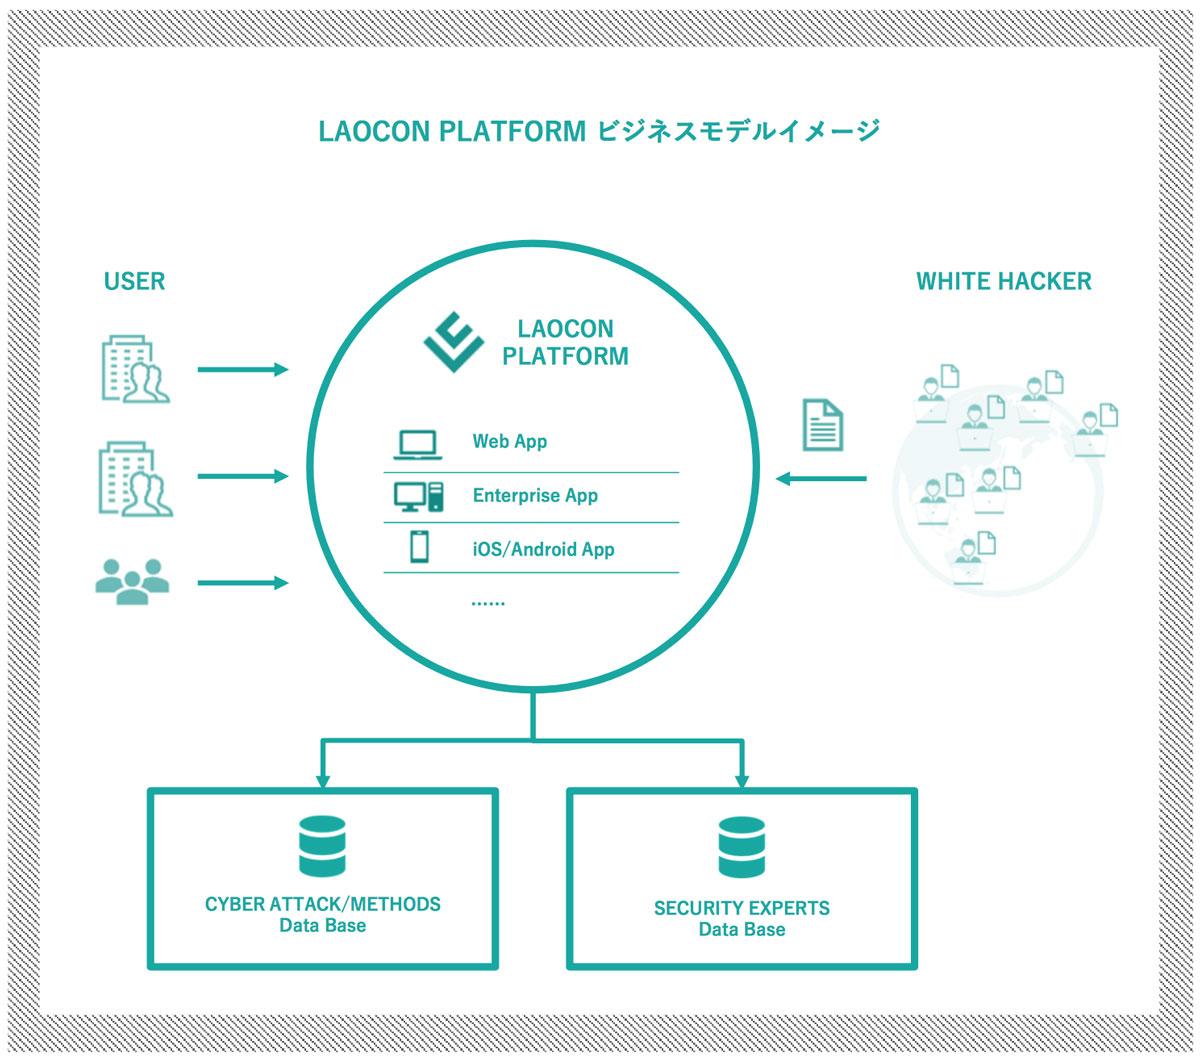 LAOCON PLATFORMのビジネスモデルイメージ(出典:LAOCONホワイトペーパー)